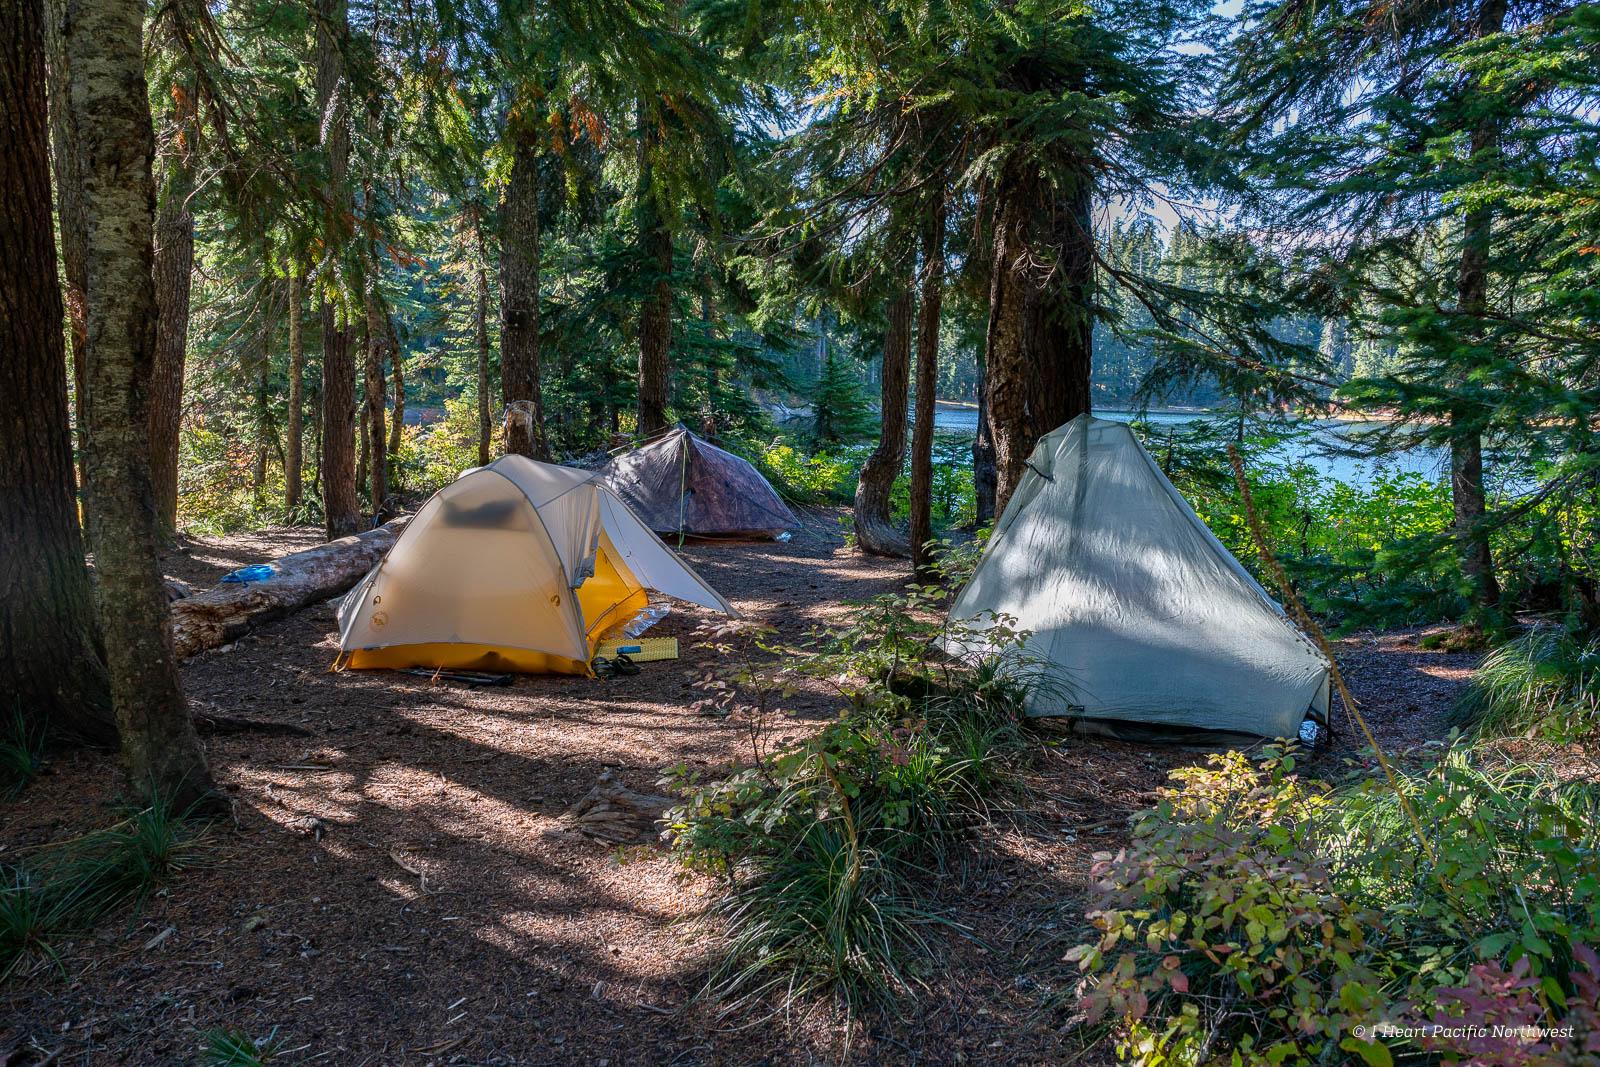 backpacking - Indian Heaven Wilderness - East Crater Trail, Bear Lake, Lemei Rock